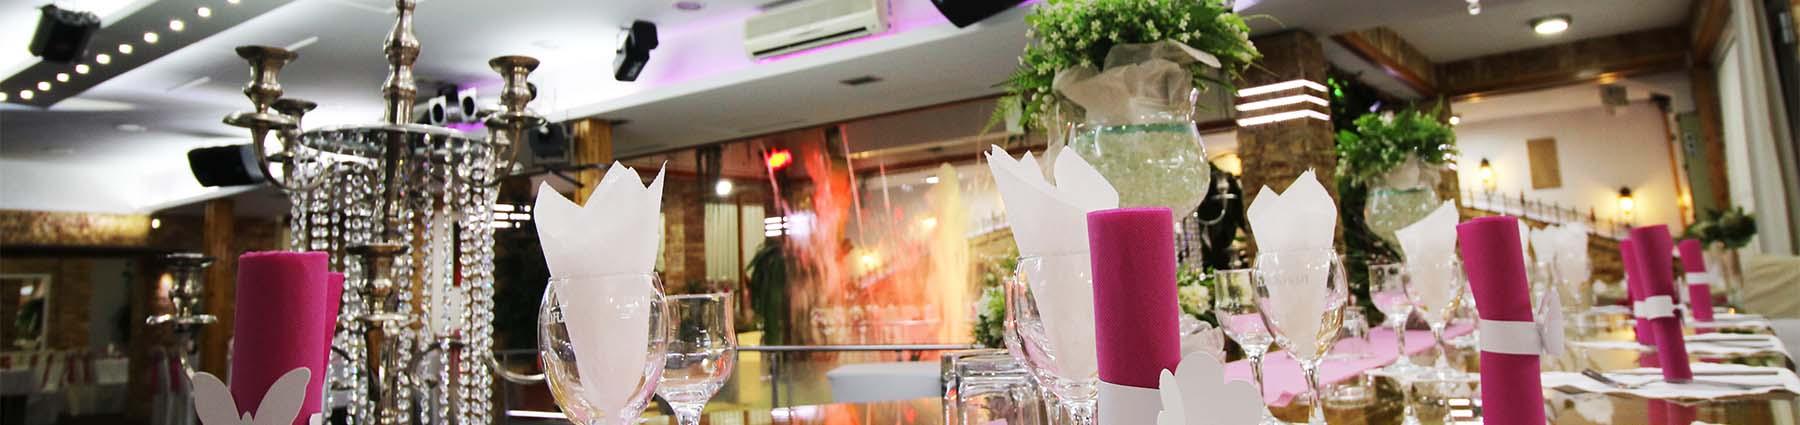 Ресторан Каскада